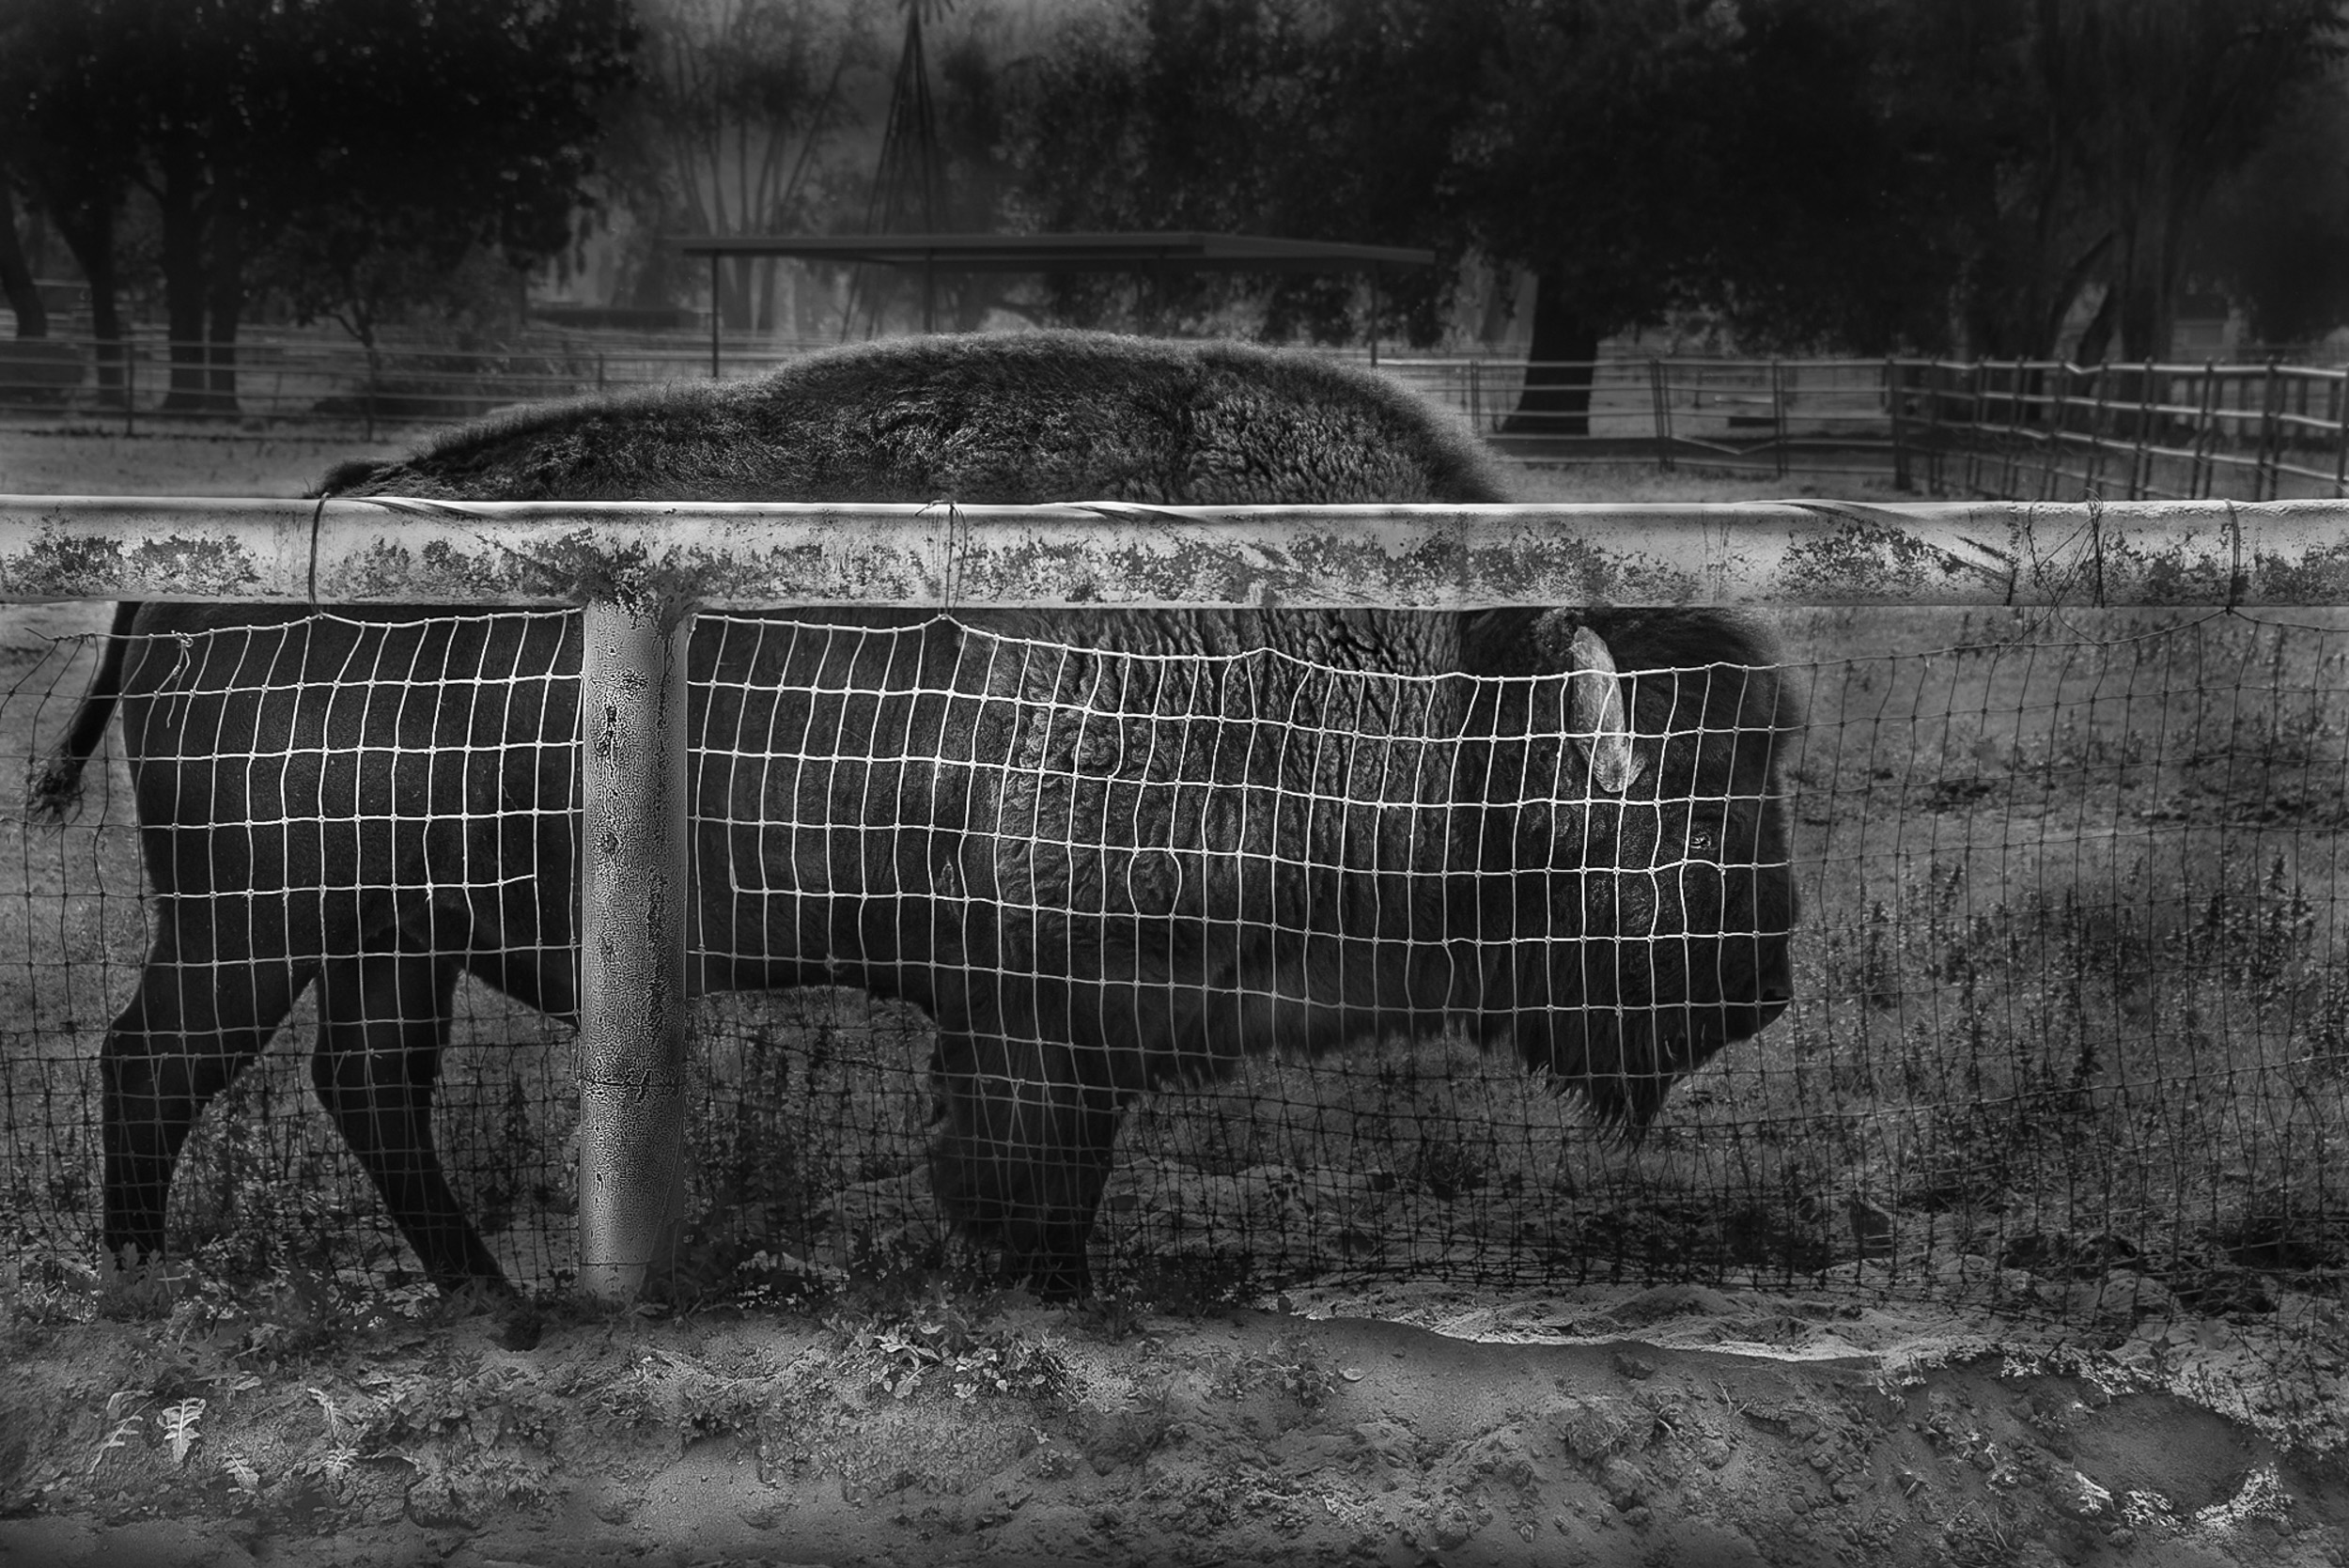 Buffalo and Fence, Pauma Valley, California  © Robert Welkie 2018